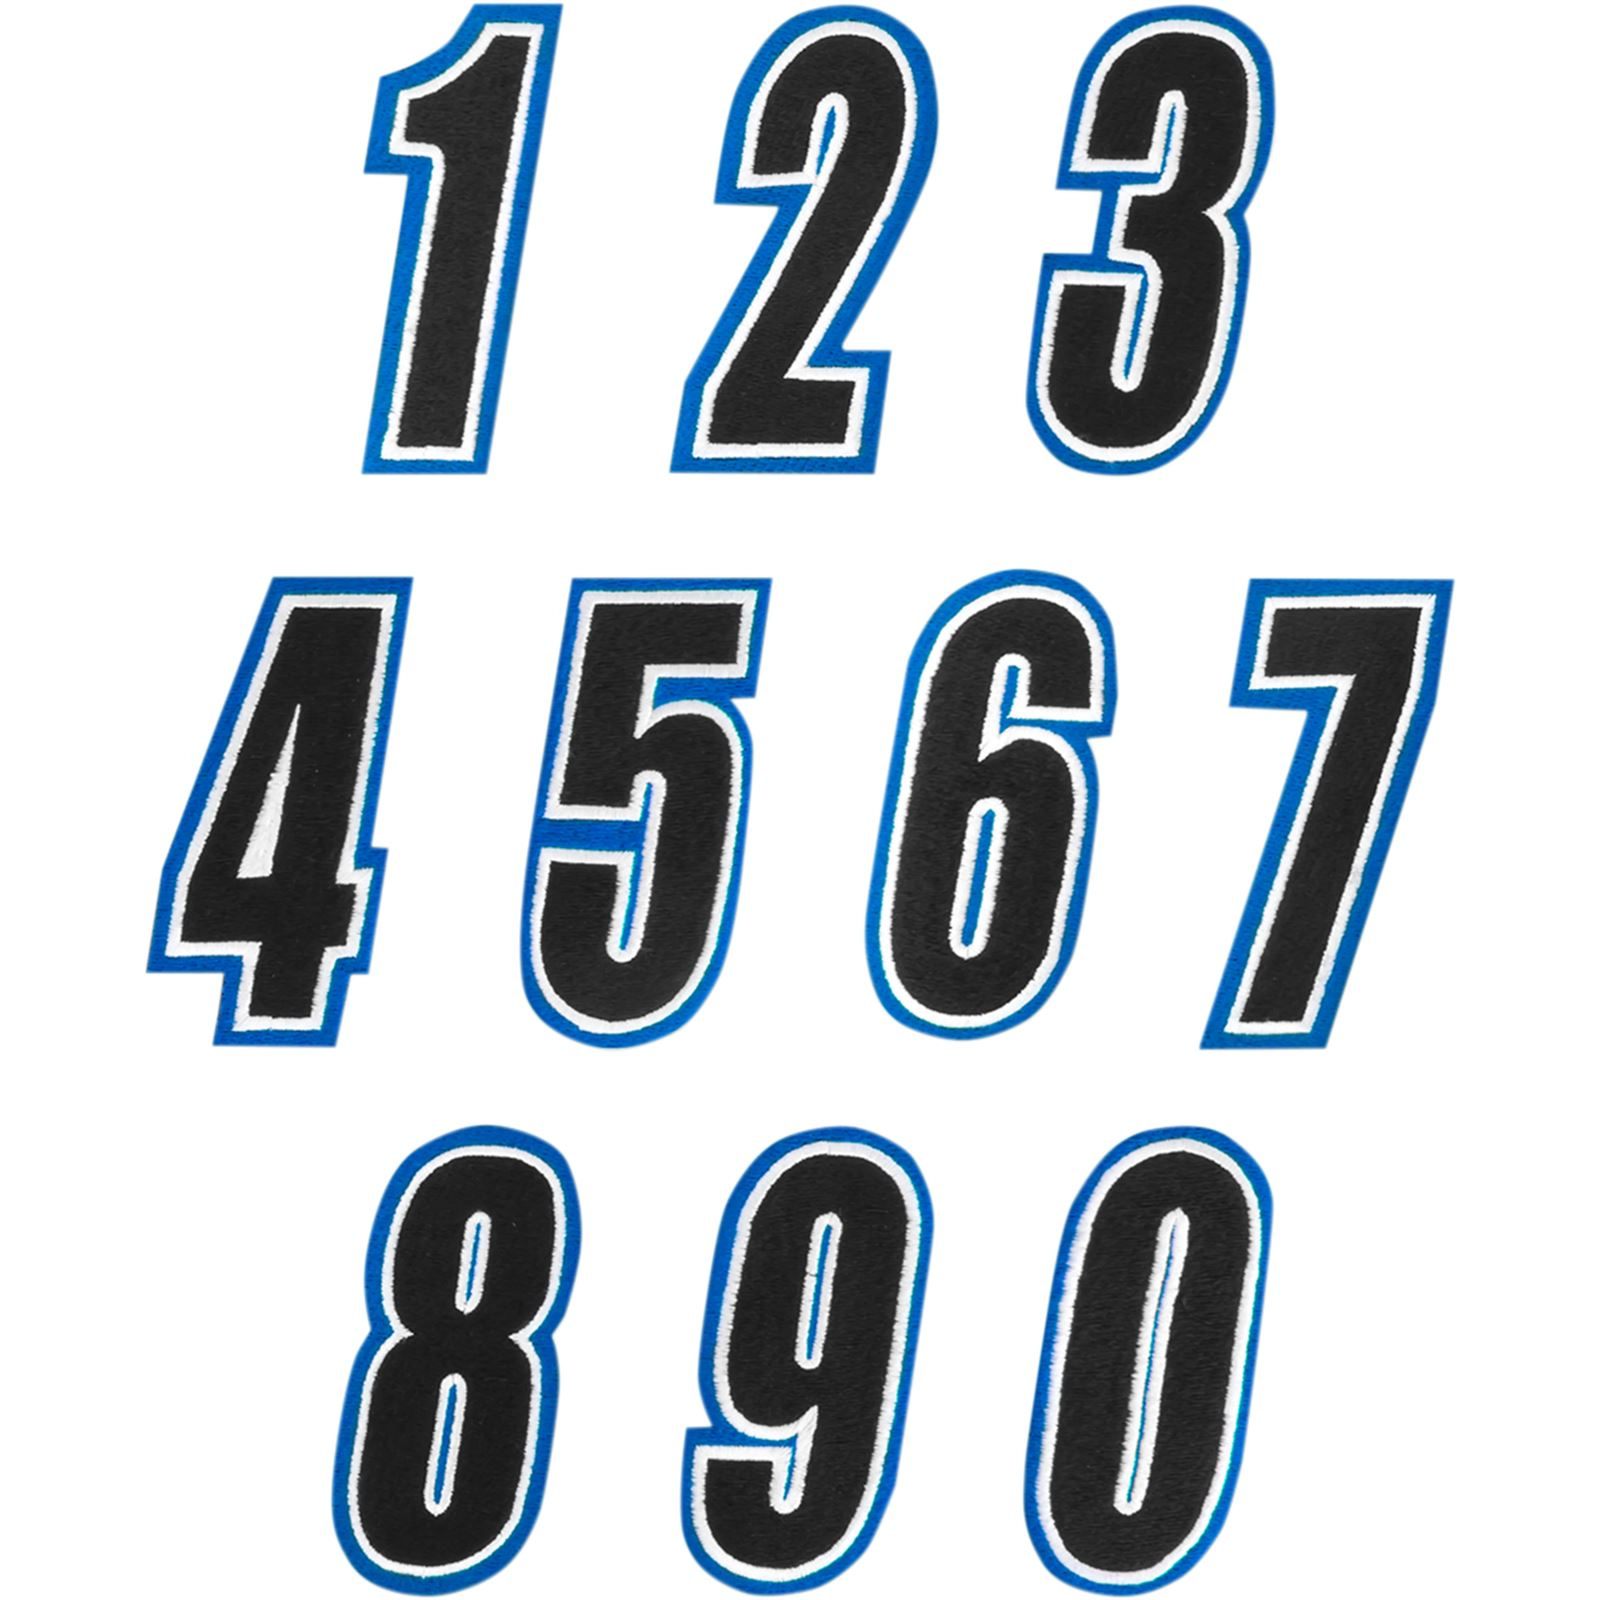 American Kargo Number Patch - Blue/Black #8